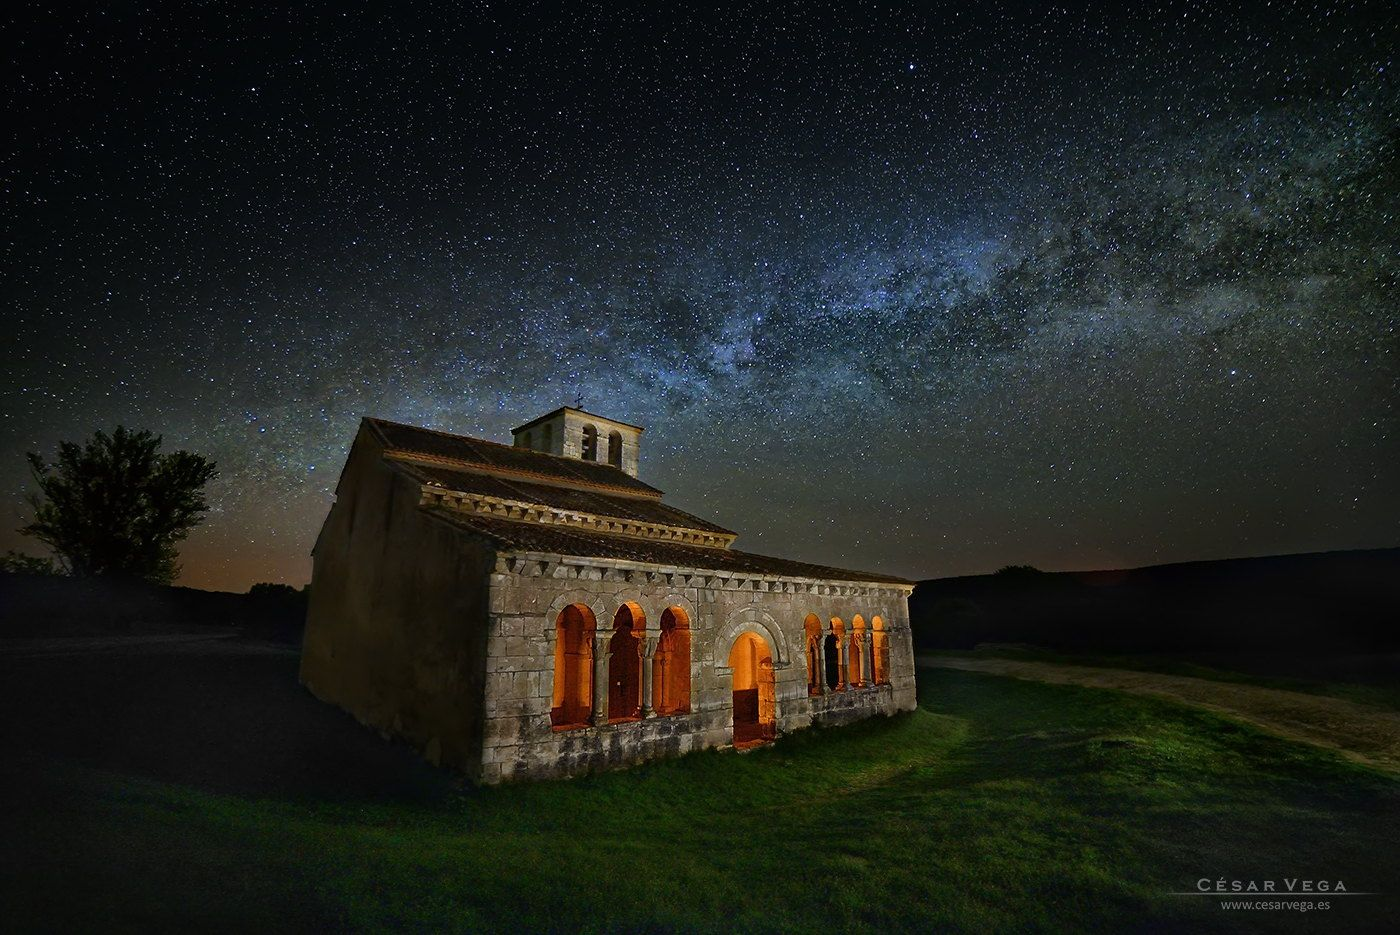 "Celestial - <A HREF=""http://www.cesarvega.es/picture.php?/1481/category/63"">Más información / More info / www.cesarvega.es</A>"